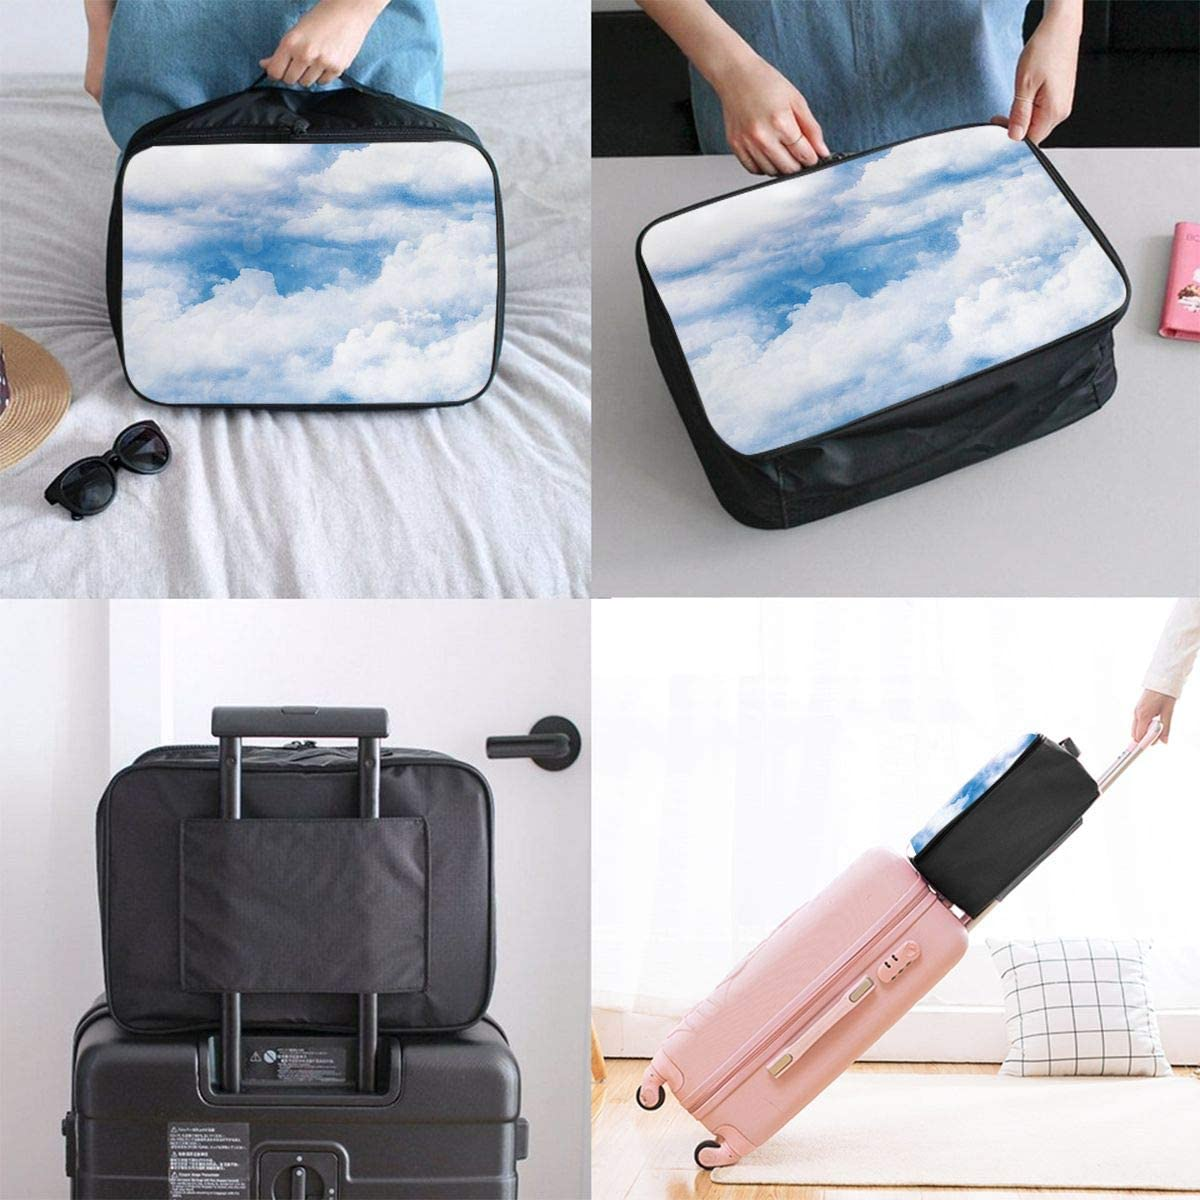 Cloud-sky Travel Carry-on Luggage Weekender Bag Overnight Tote Flight Duffel In Trolley Handle